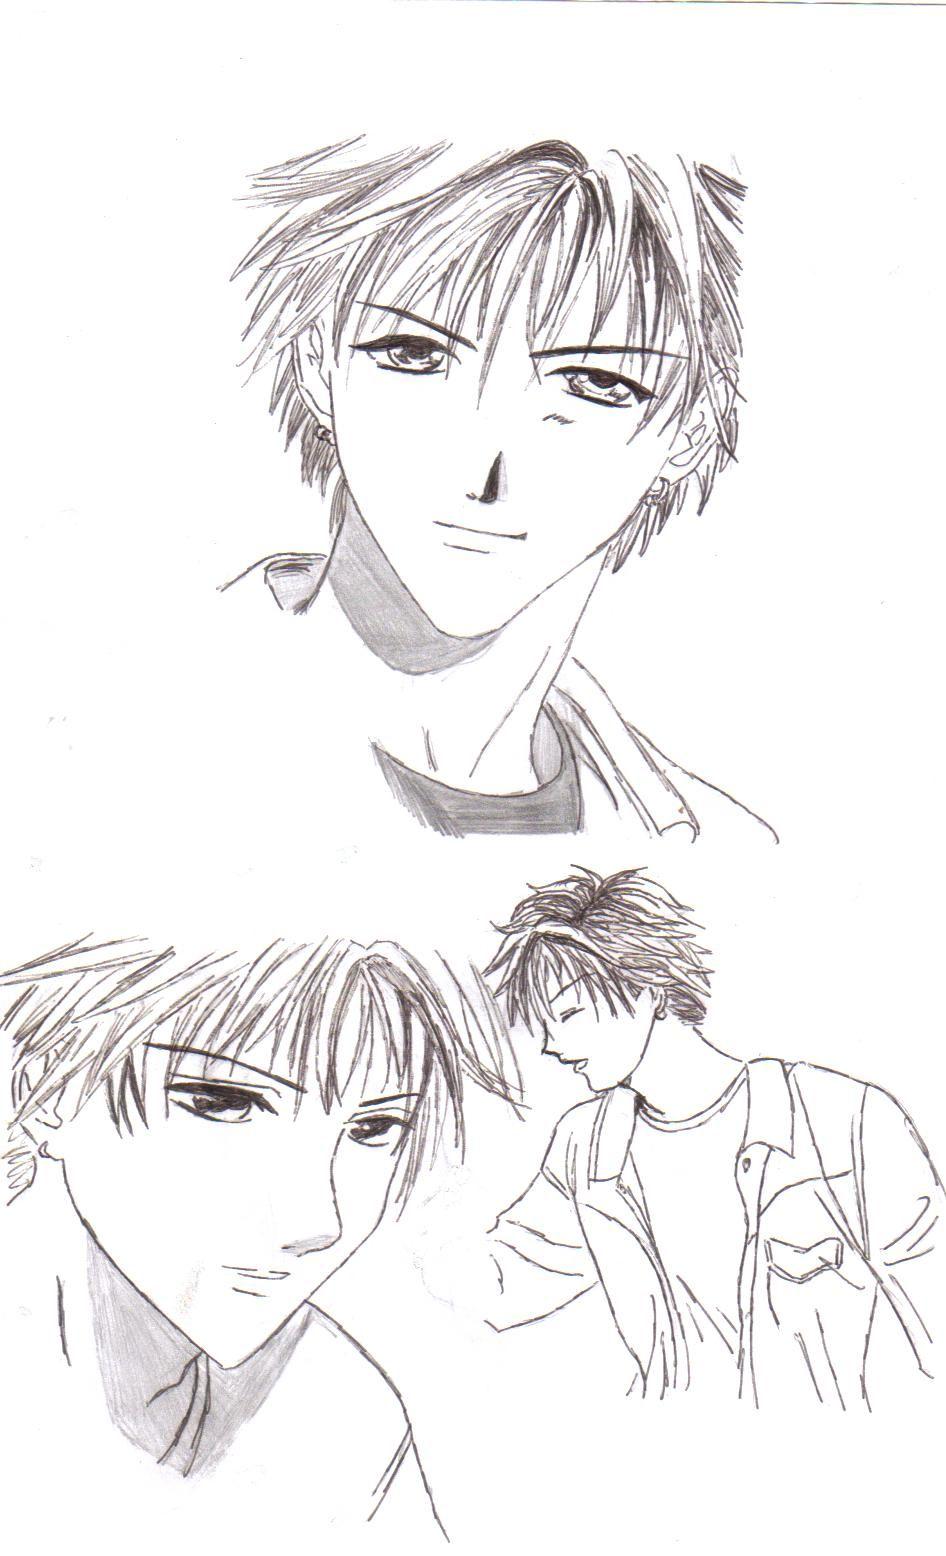 Dessin page 2 - Dessin manga image ...